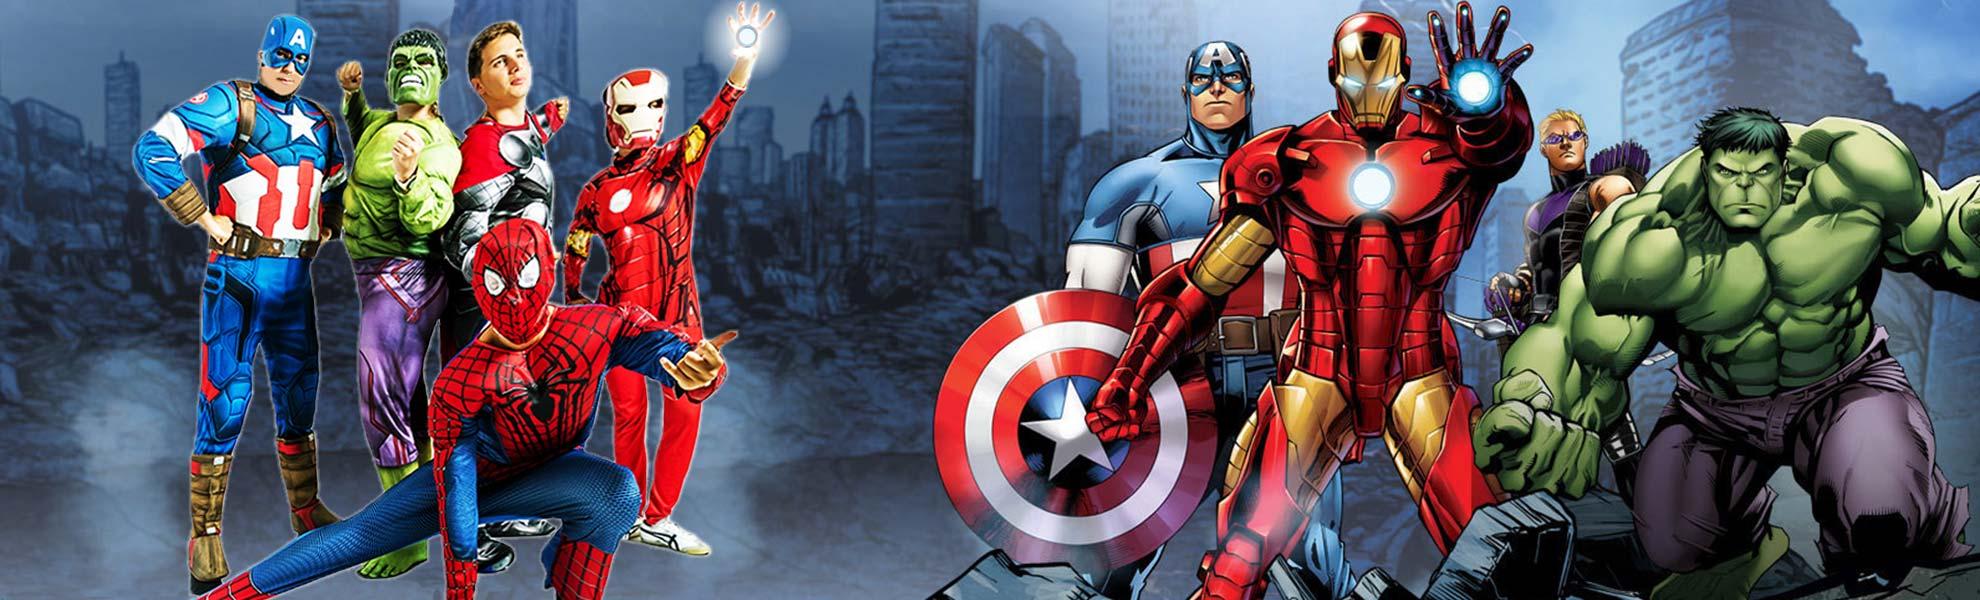 Festa compleanno Avengers